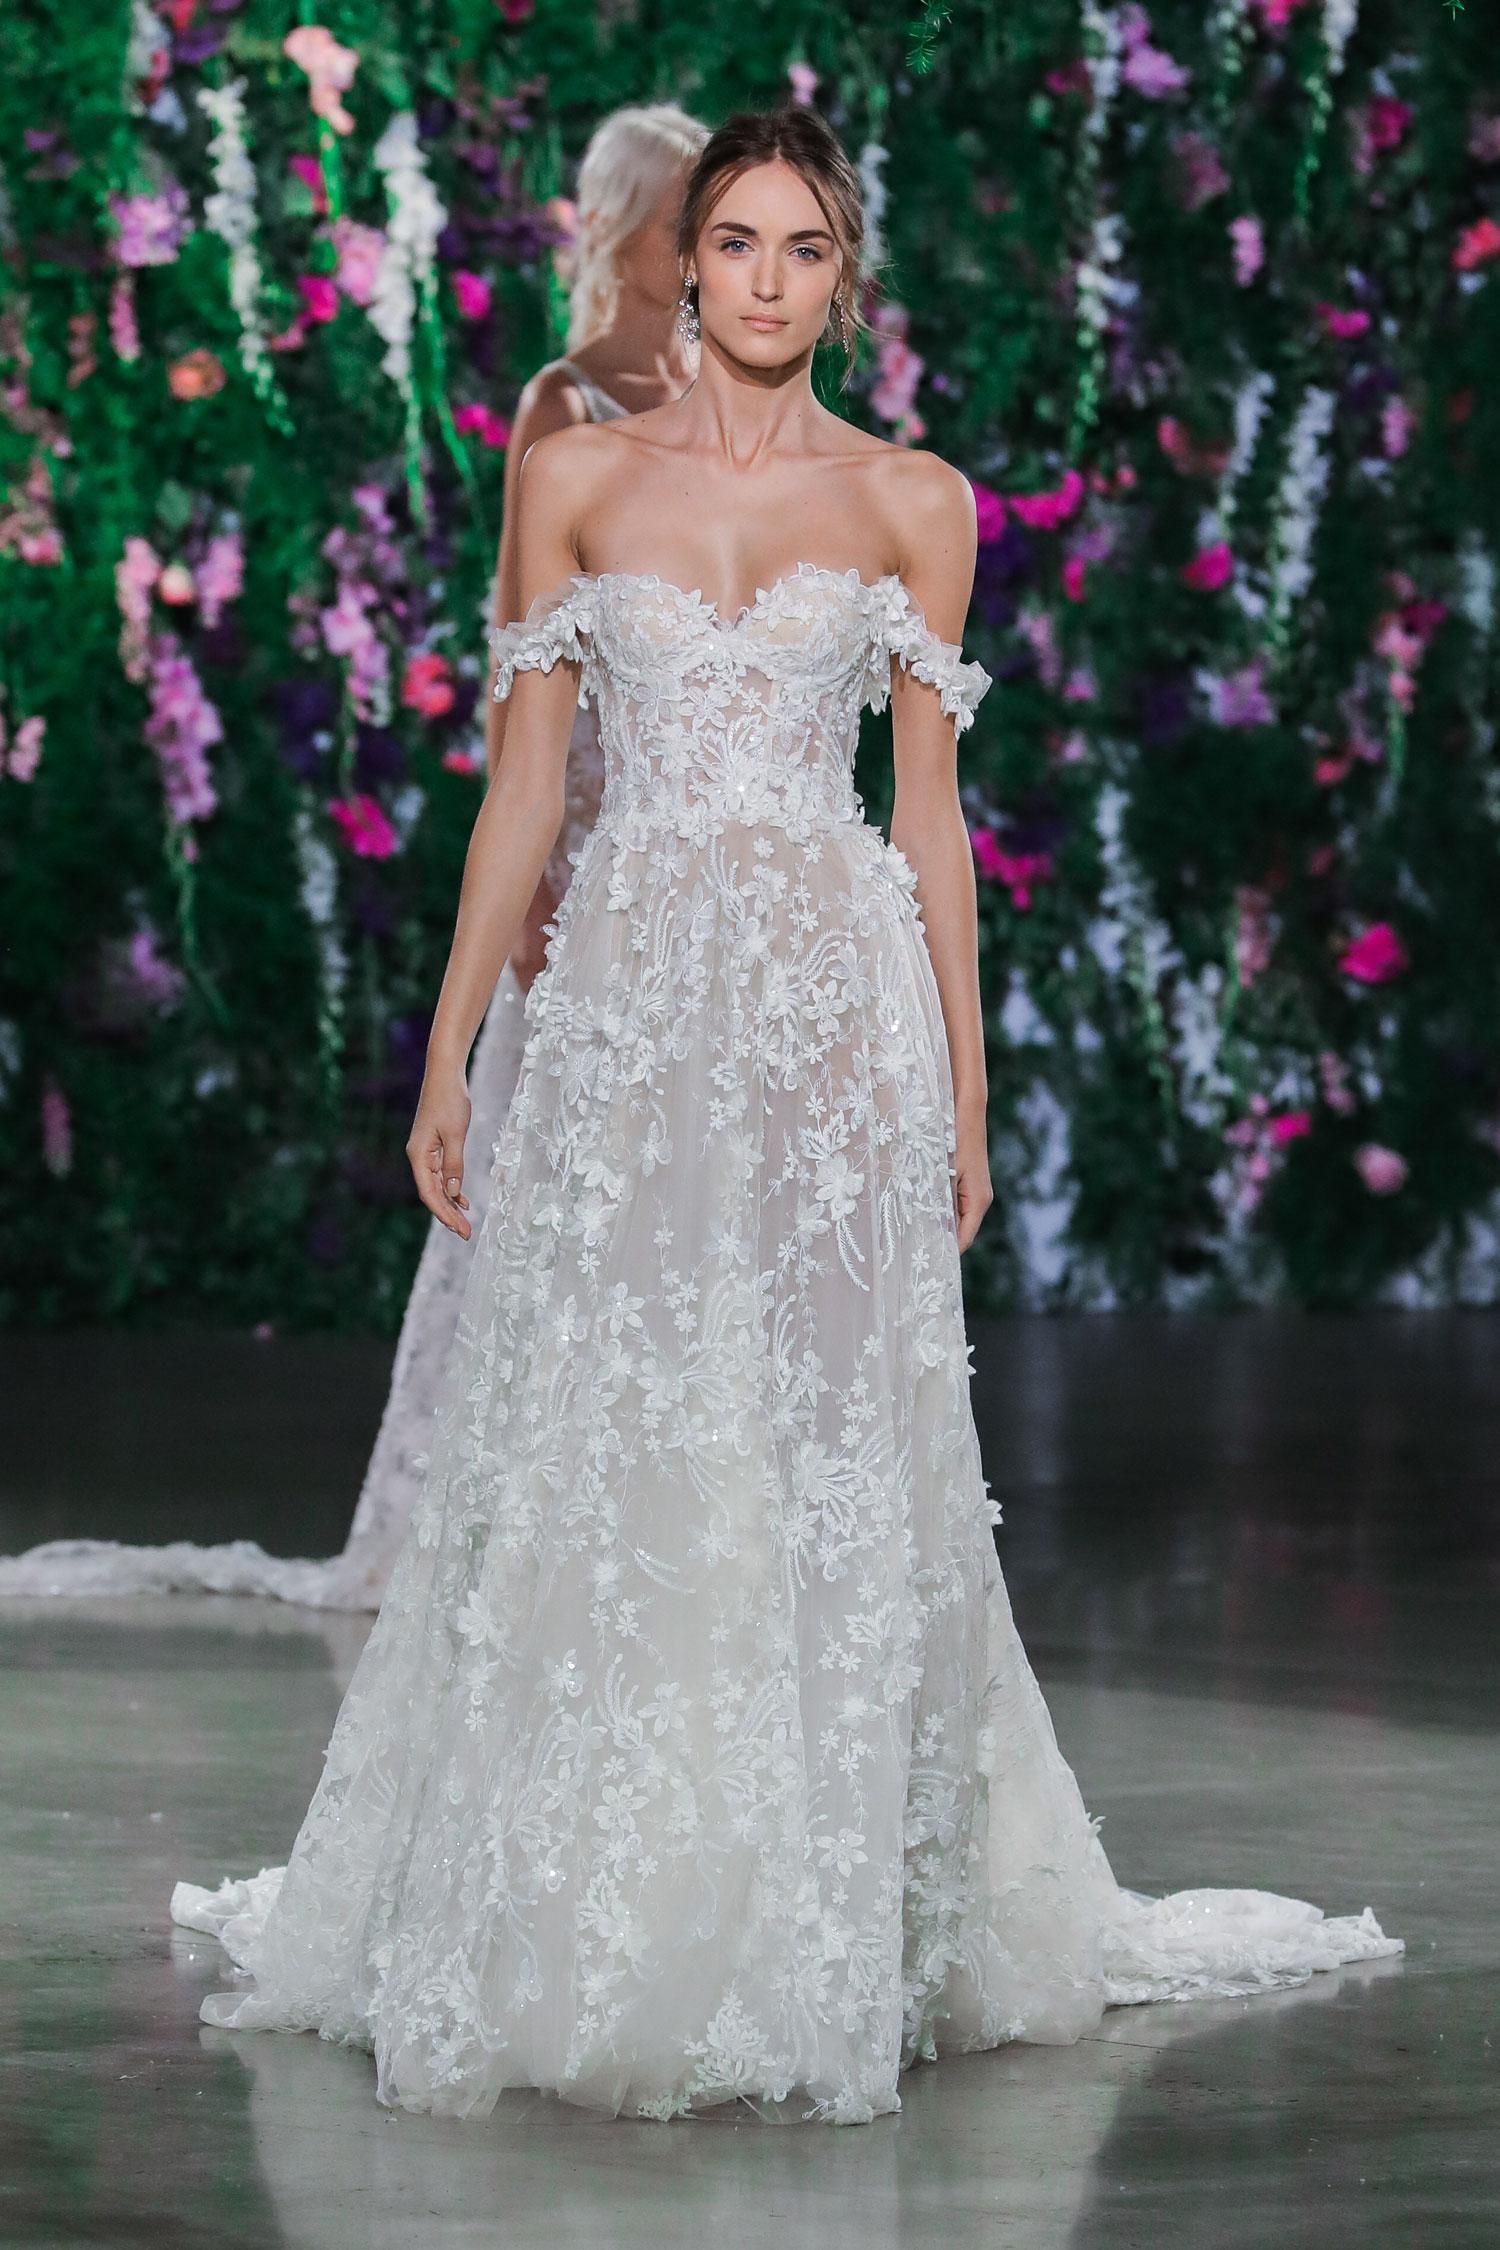 Off the shoulder wedding dress with sweetheart neckline by Gala by Galia Lahav